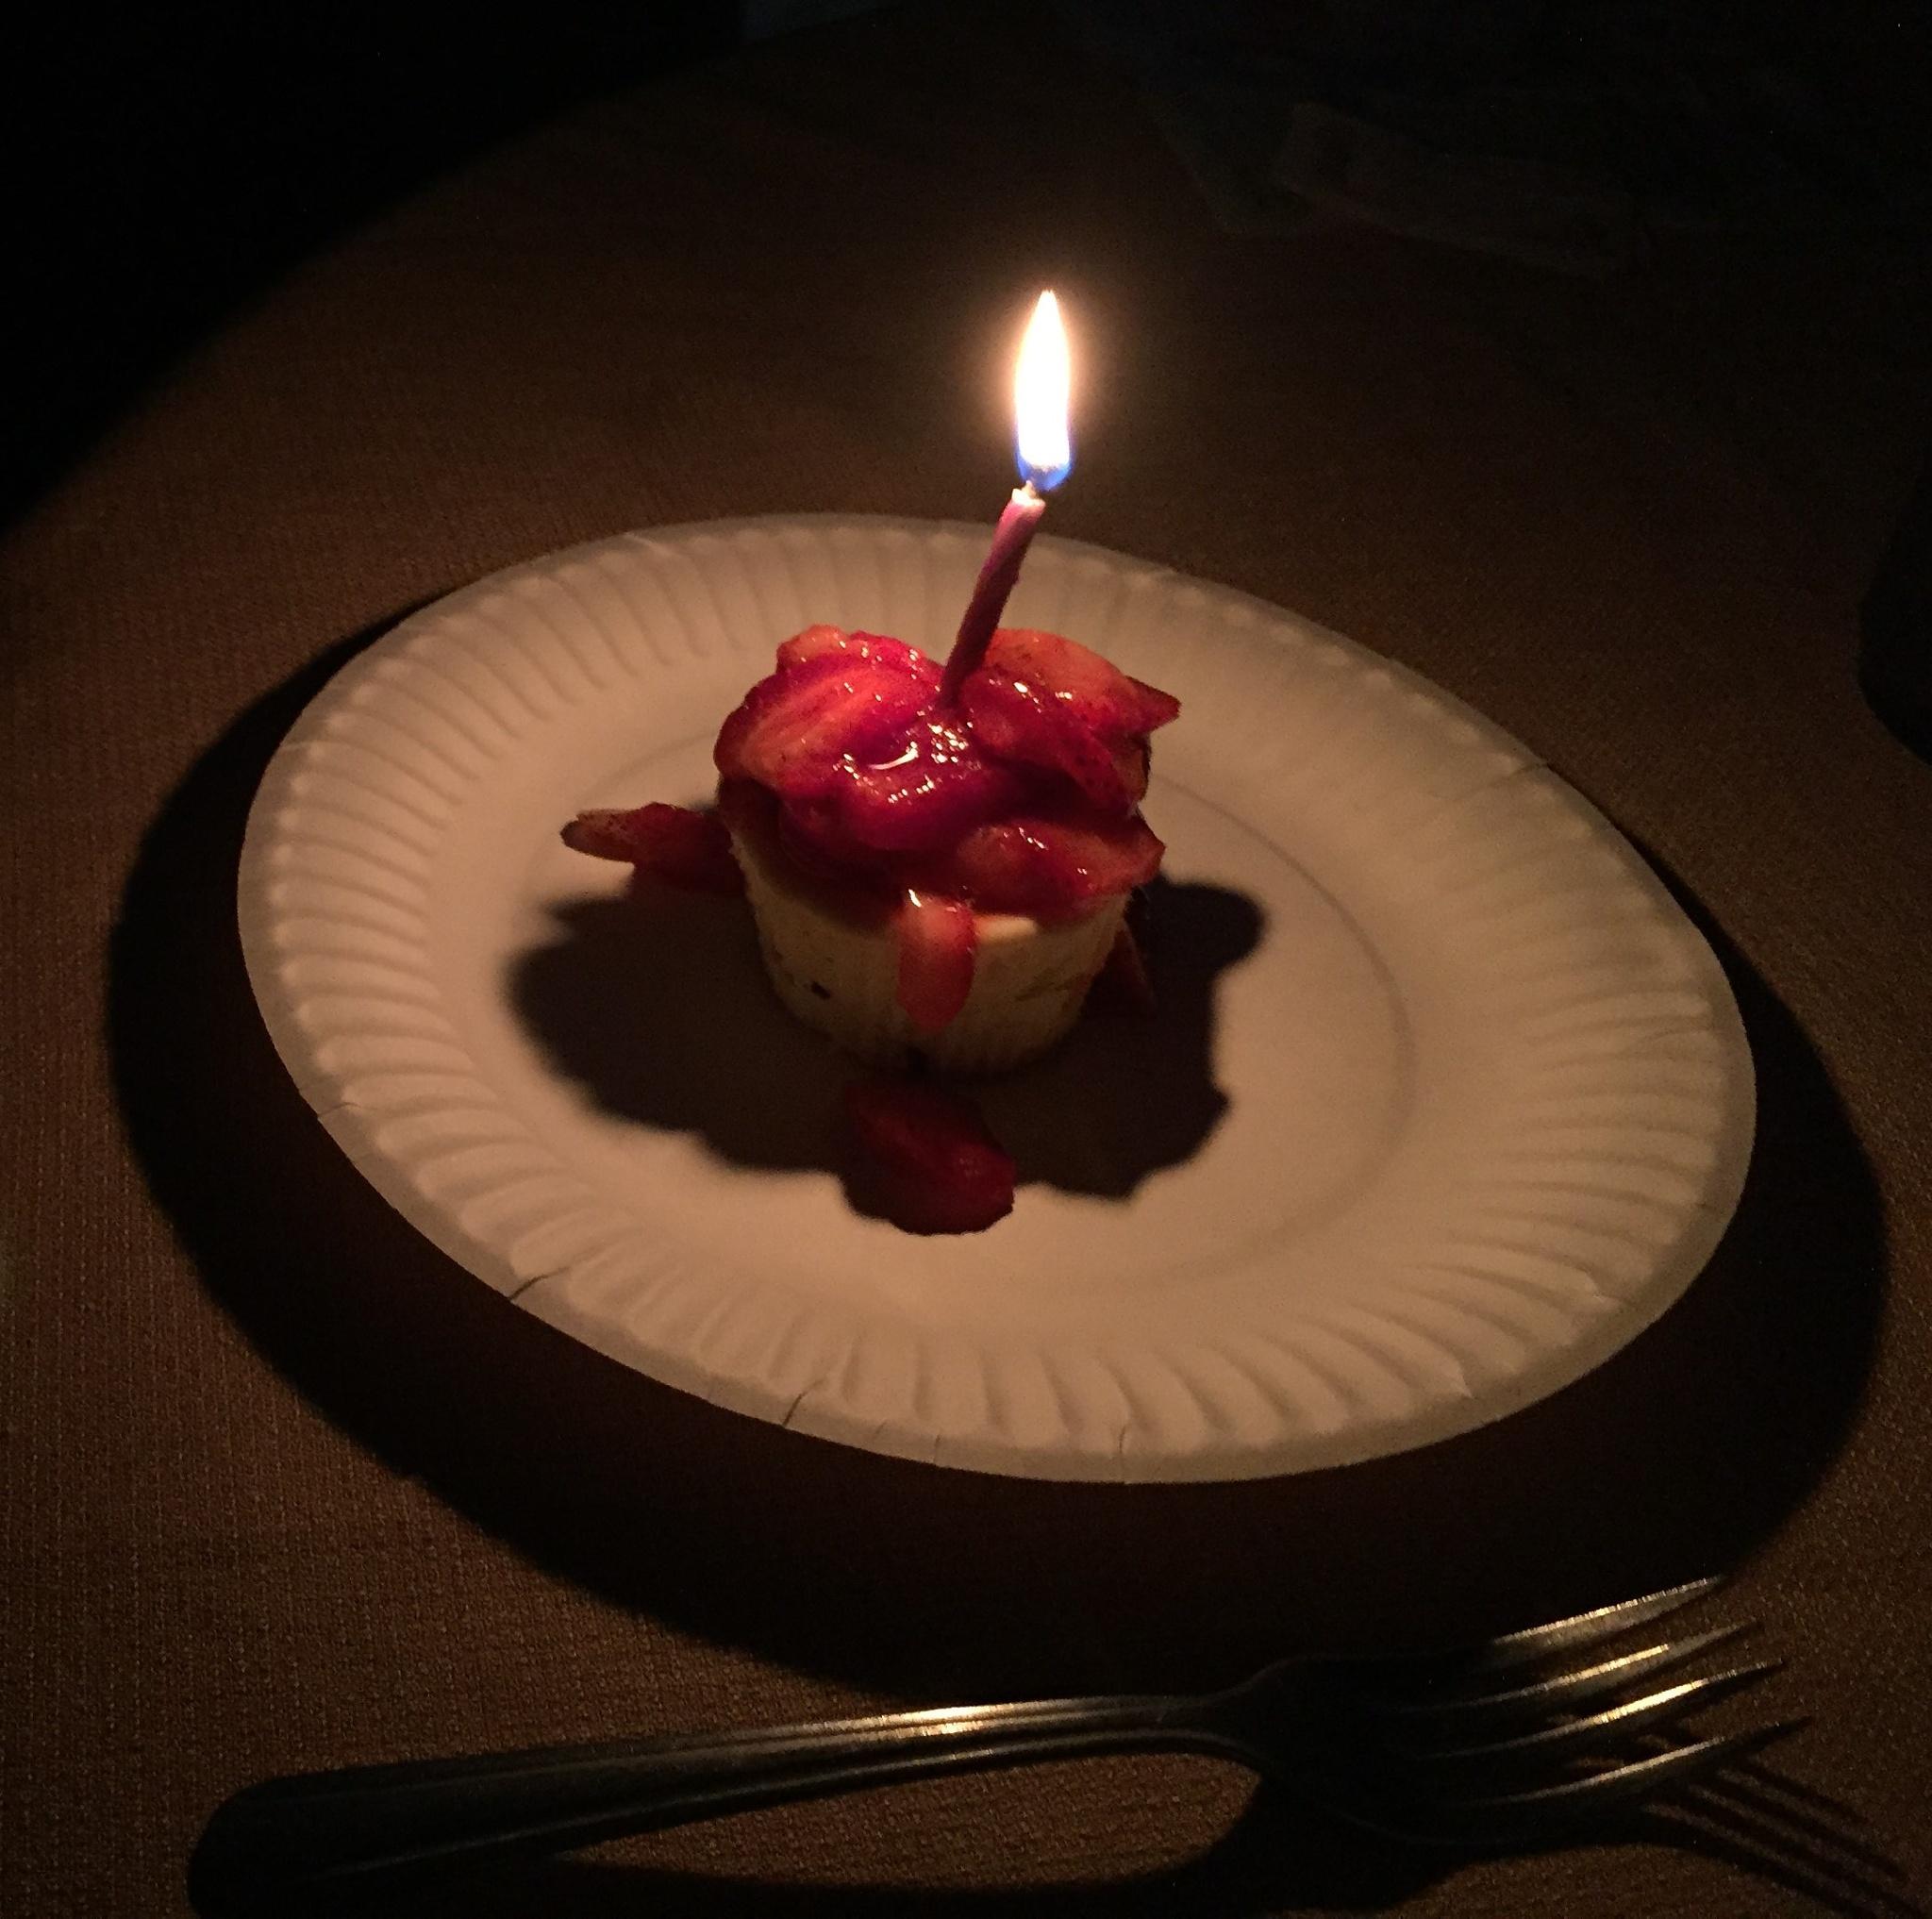 Happy birthday by kkstephenson